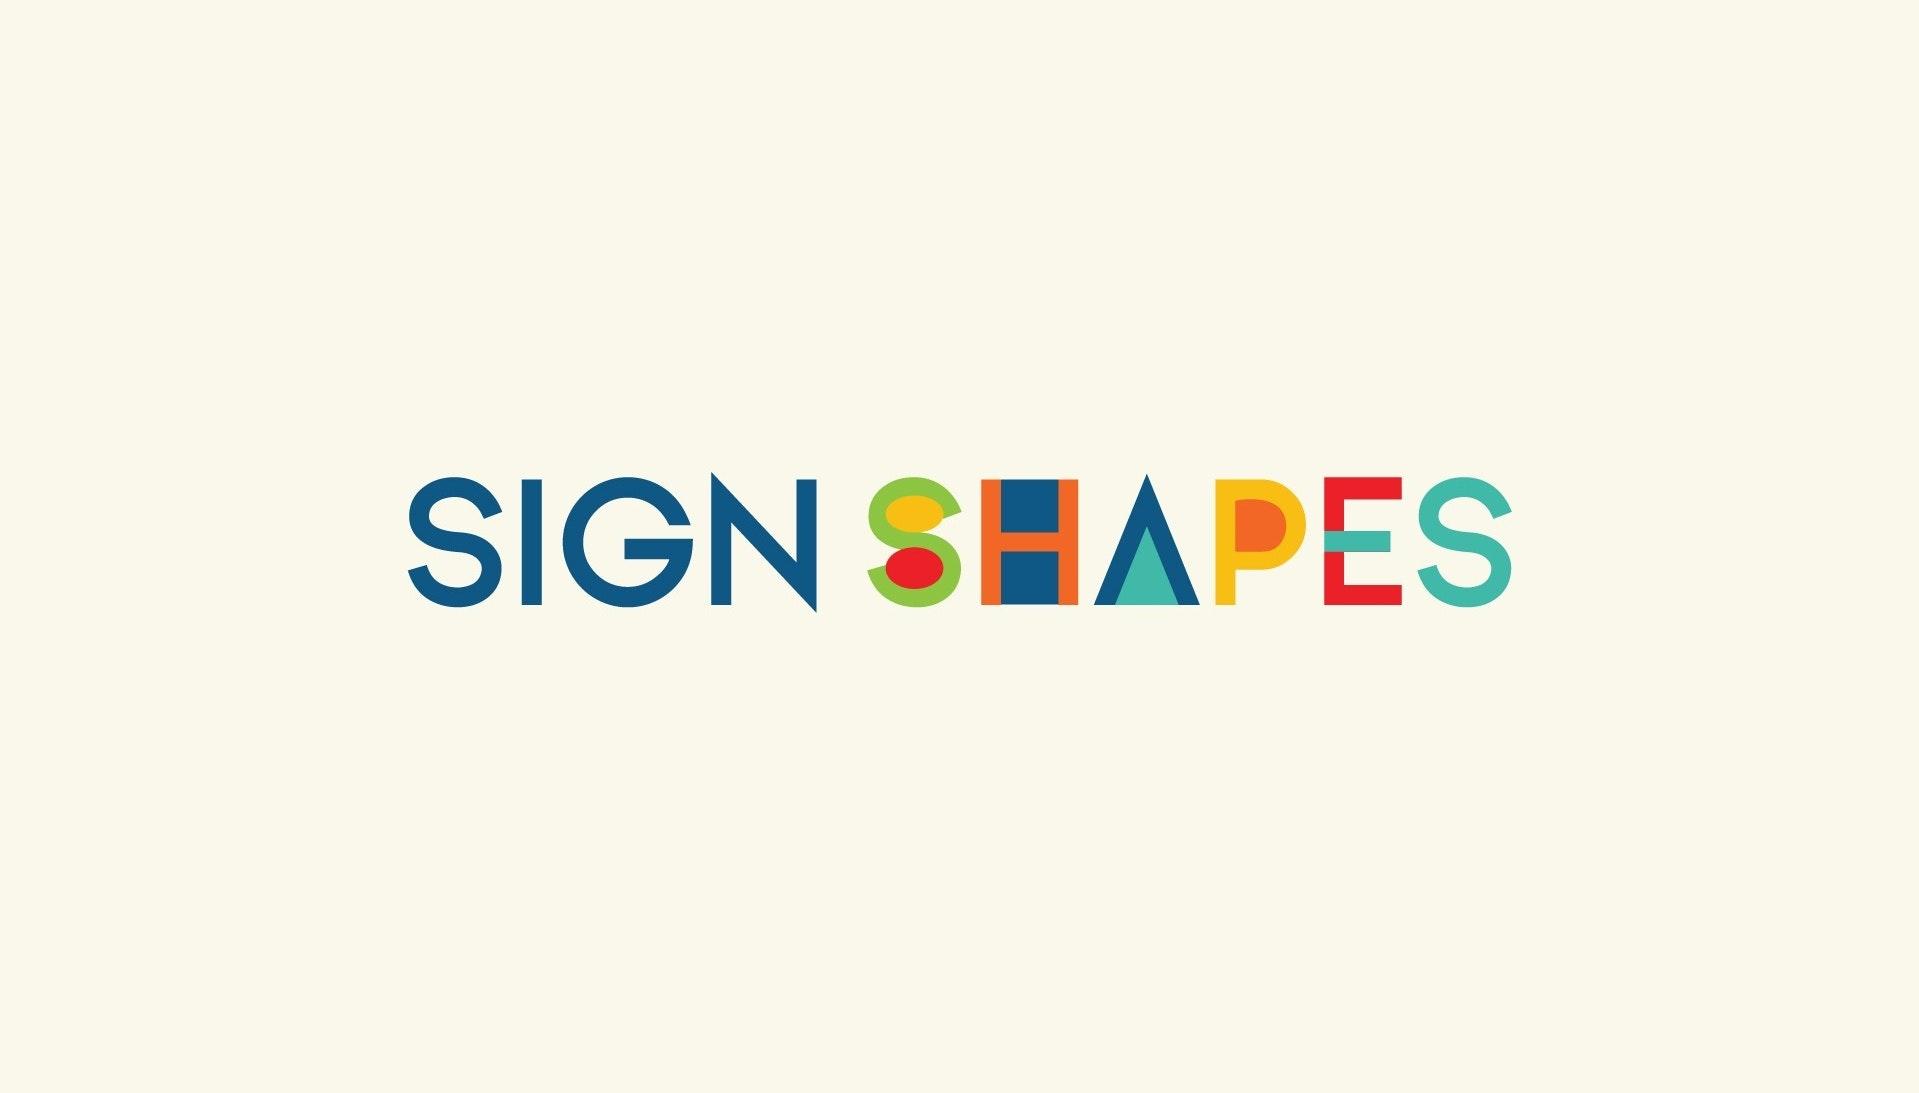 signshapes logo